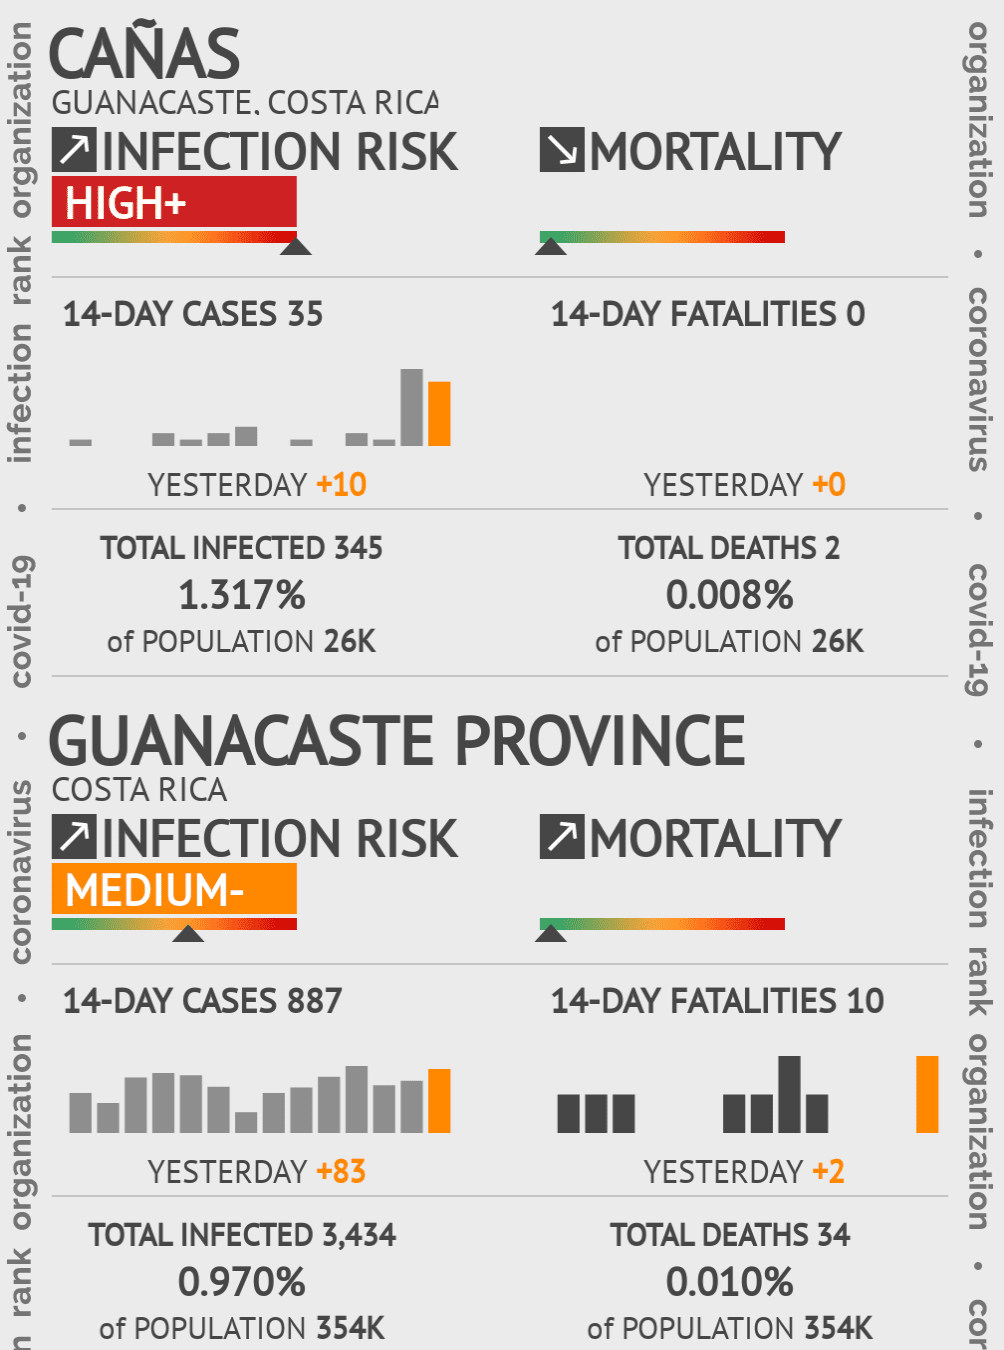 Cañas Coronavirus Covid-19 Risk of Infection on January 04, 2021